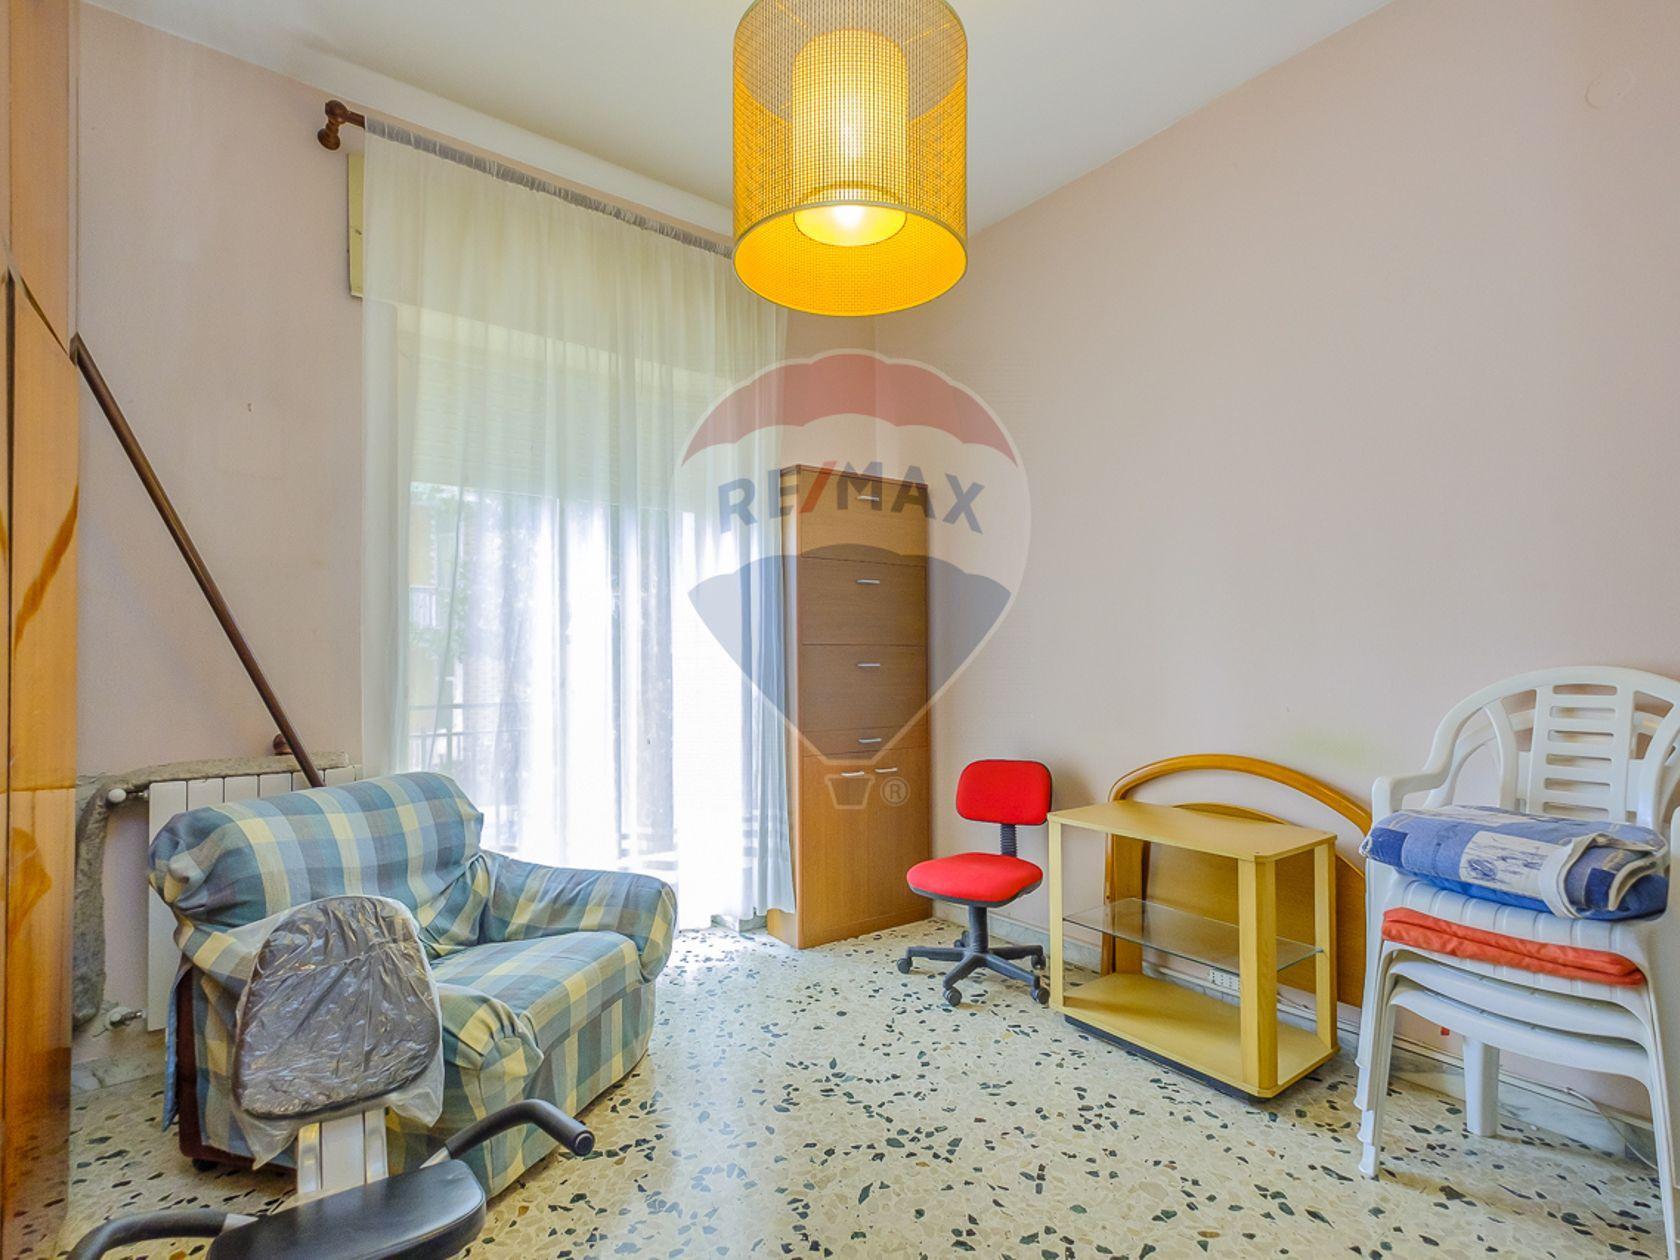 Appartamento Siracusa- Scala Greca S. Panagia Teracati Zecchino, Siracusa, SR Vendita - Foto 14